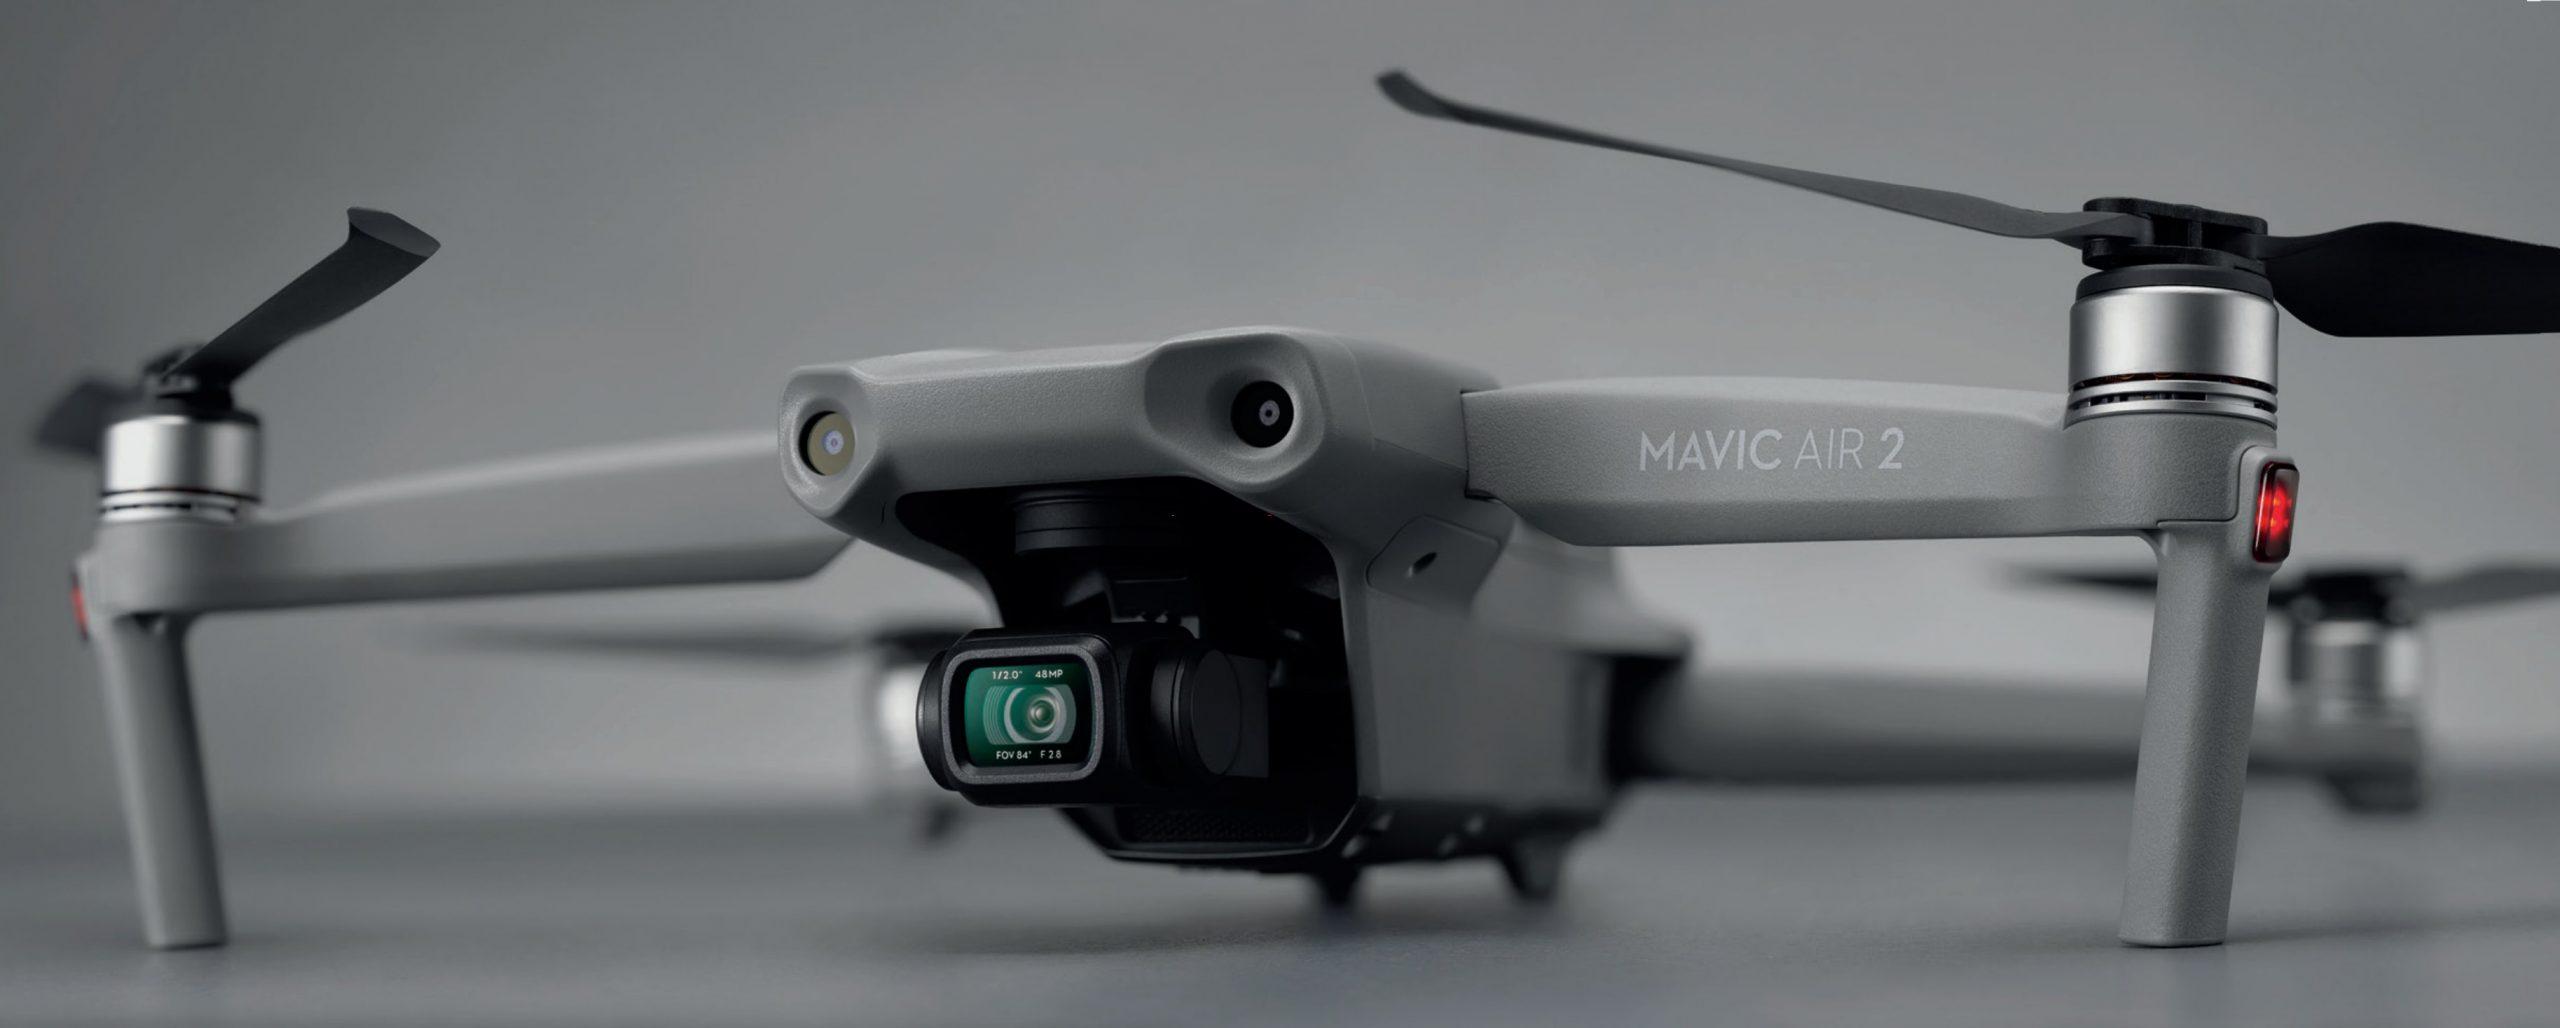 DJI Mavic Air 2 Buy online